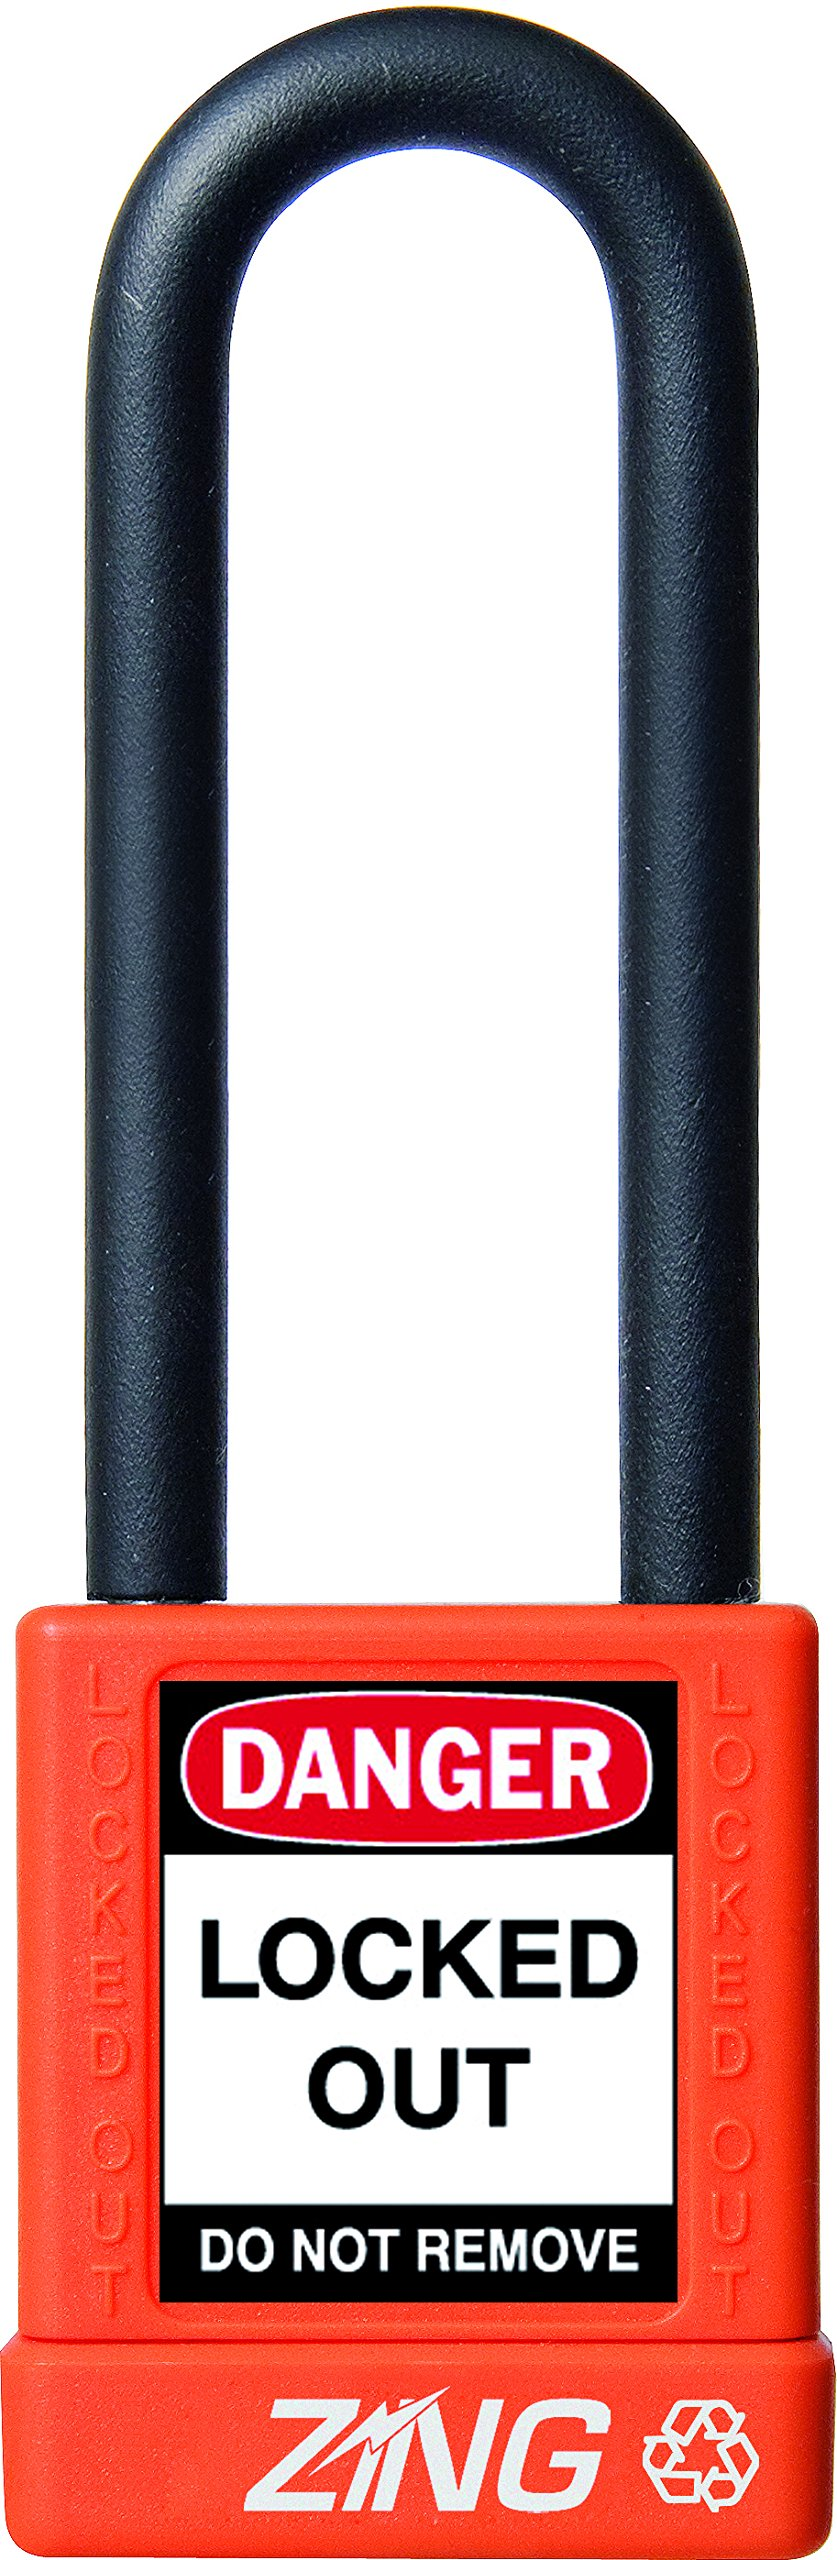 ZING 7058 RecycLock Safety Padlock, Keyed Different, 3'' Shackle, 1-3/4'' Body, Orange